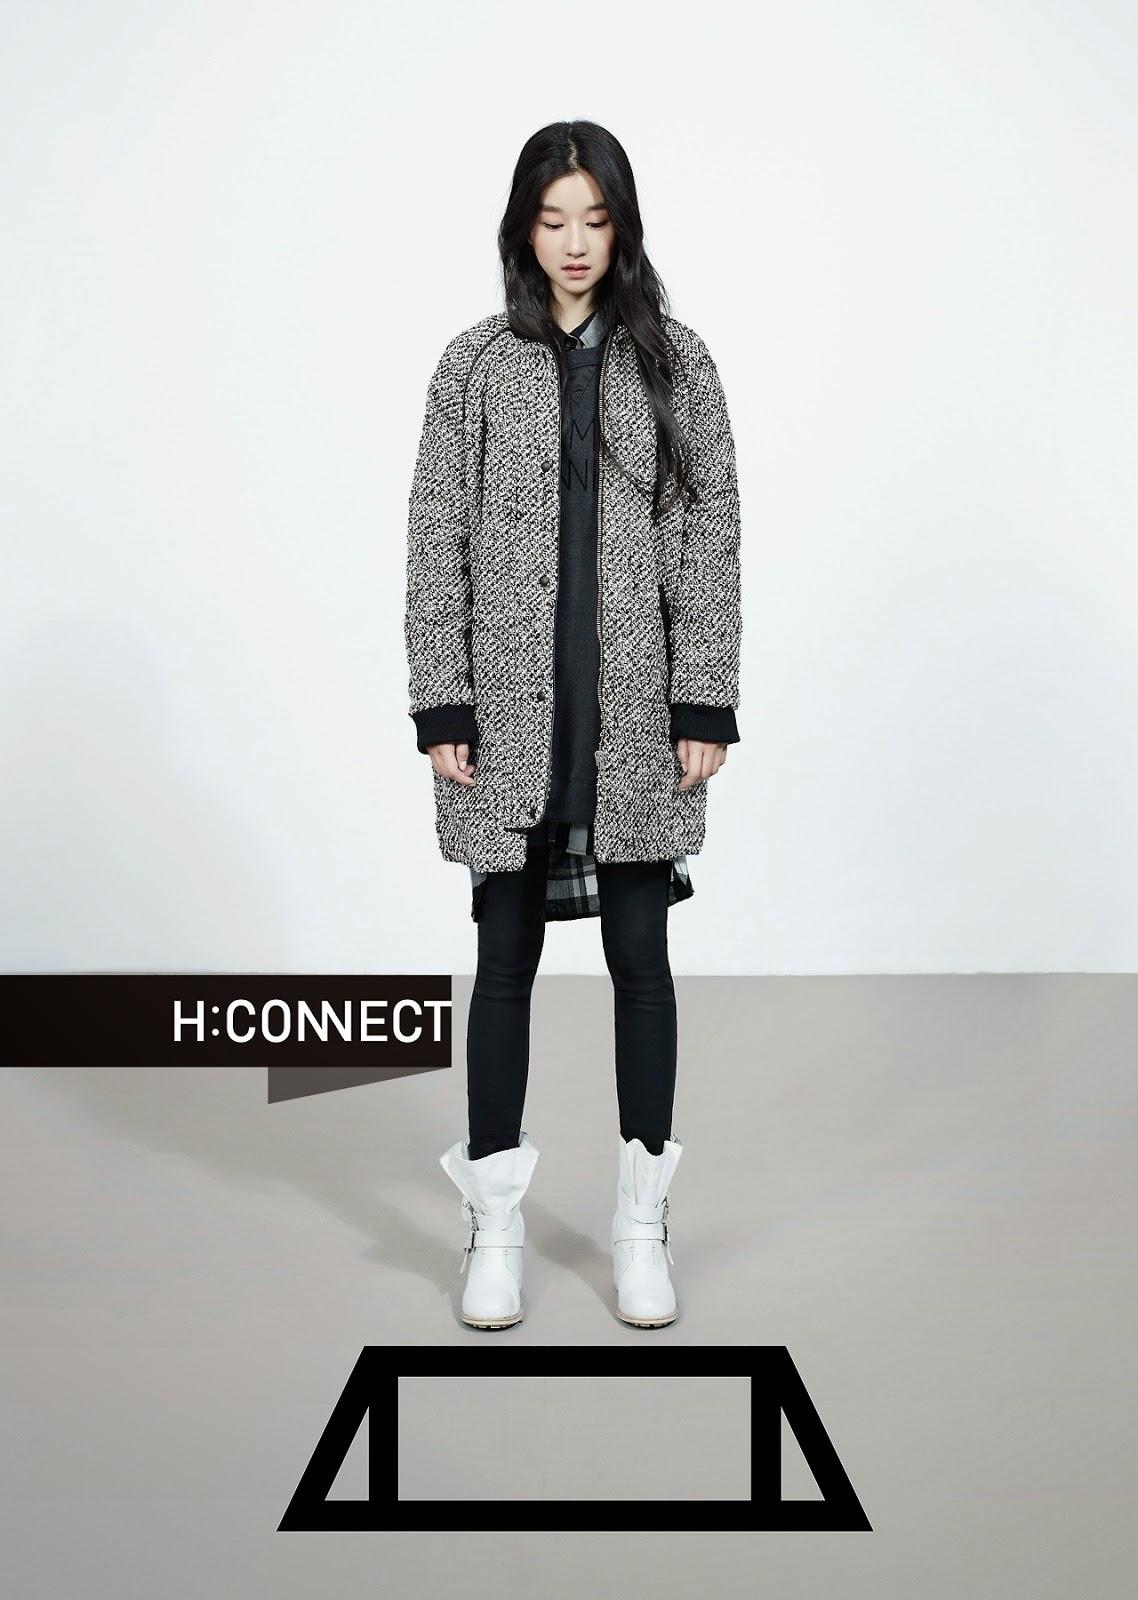 Seo Ye Ji - H Connect Fall Winter 2014